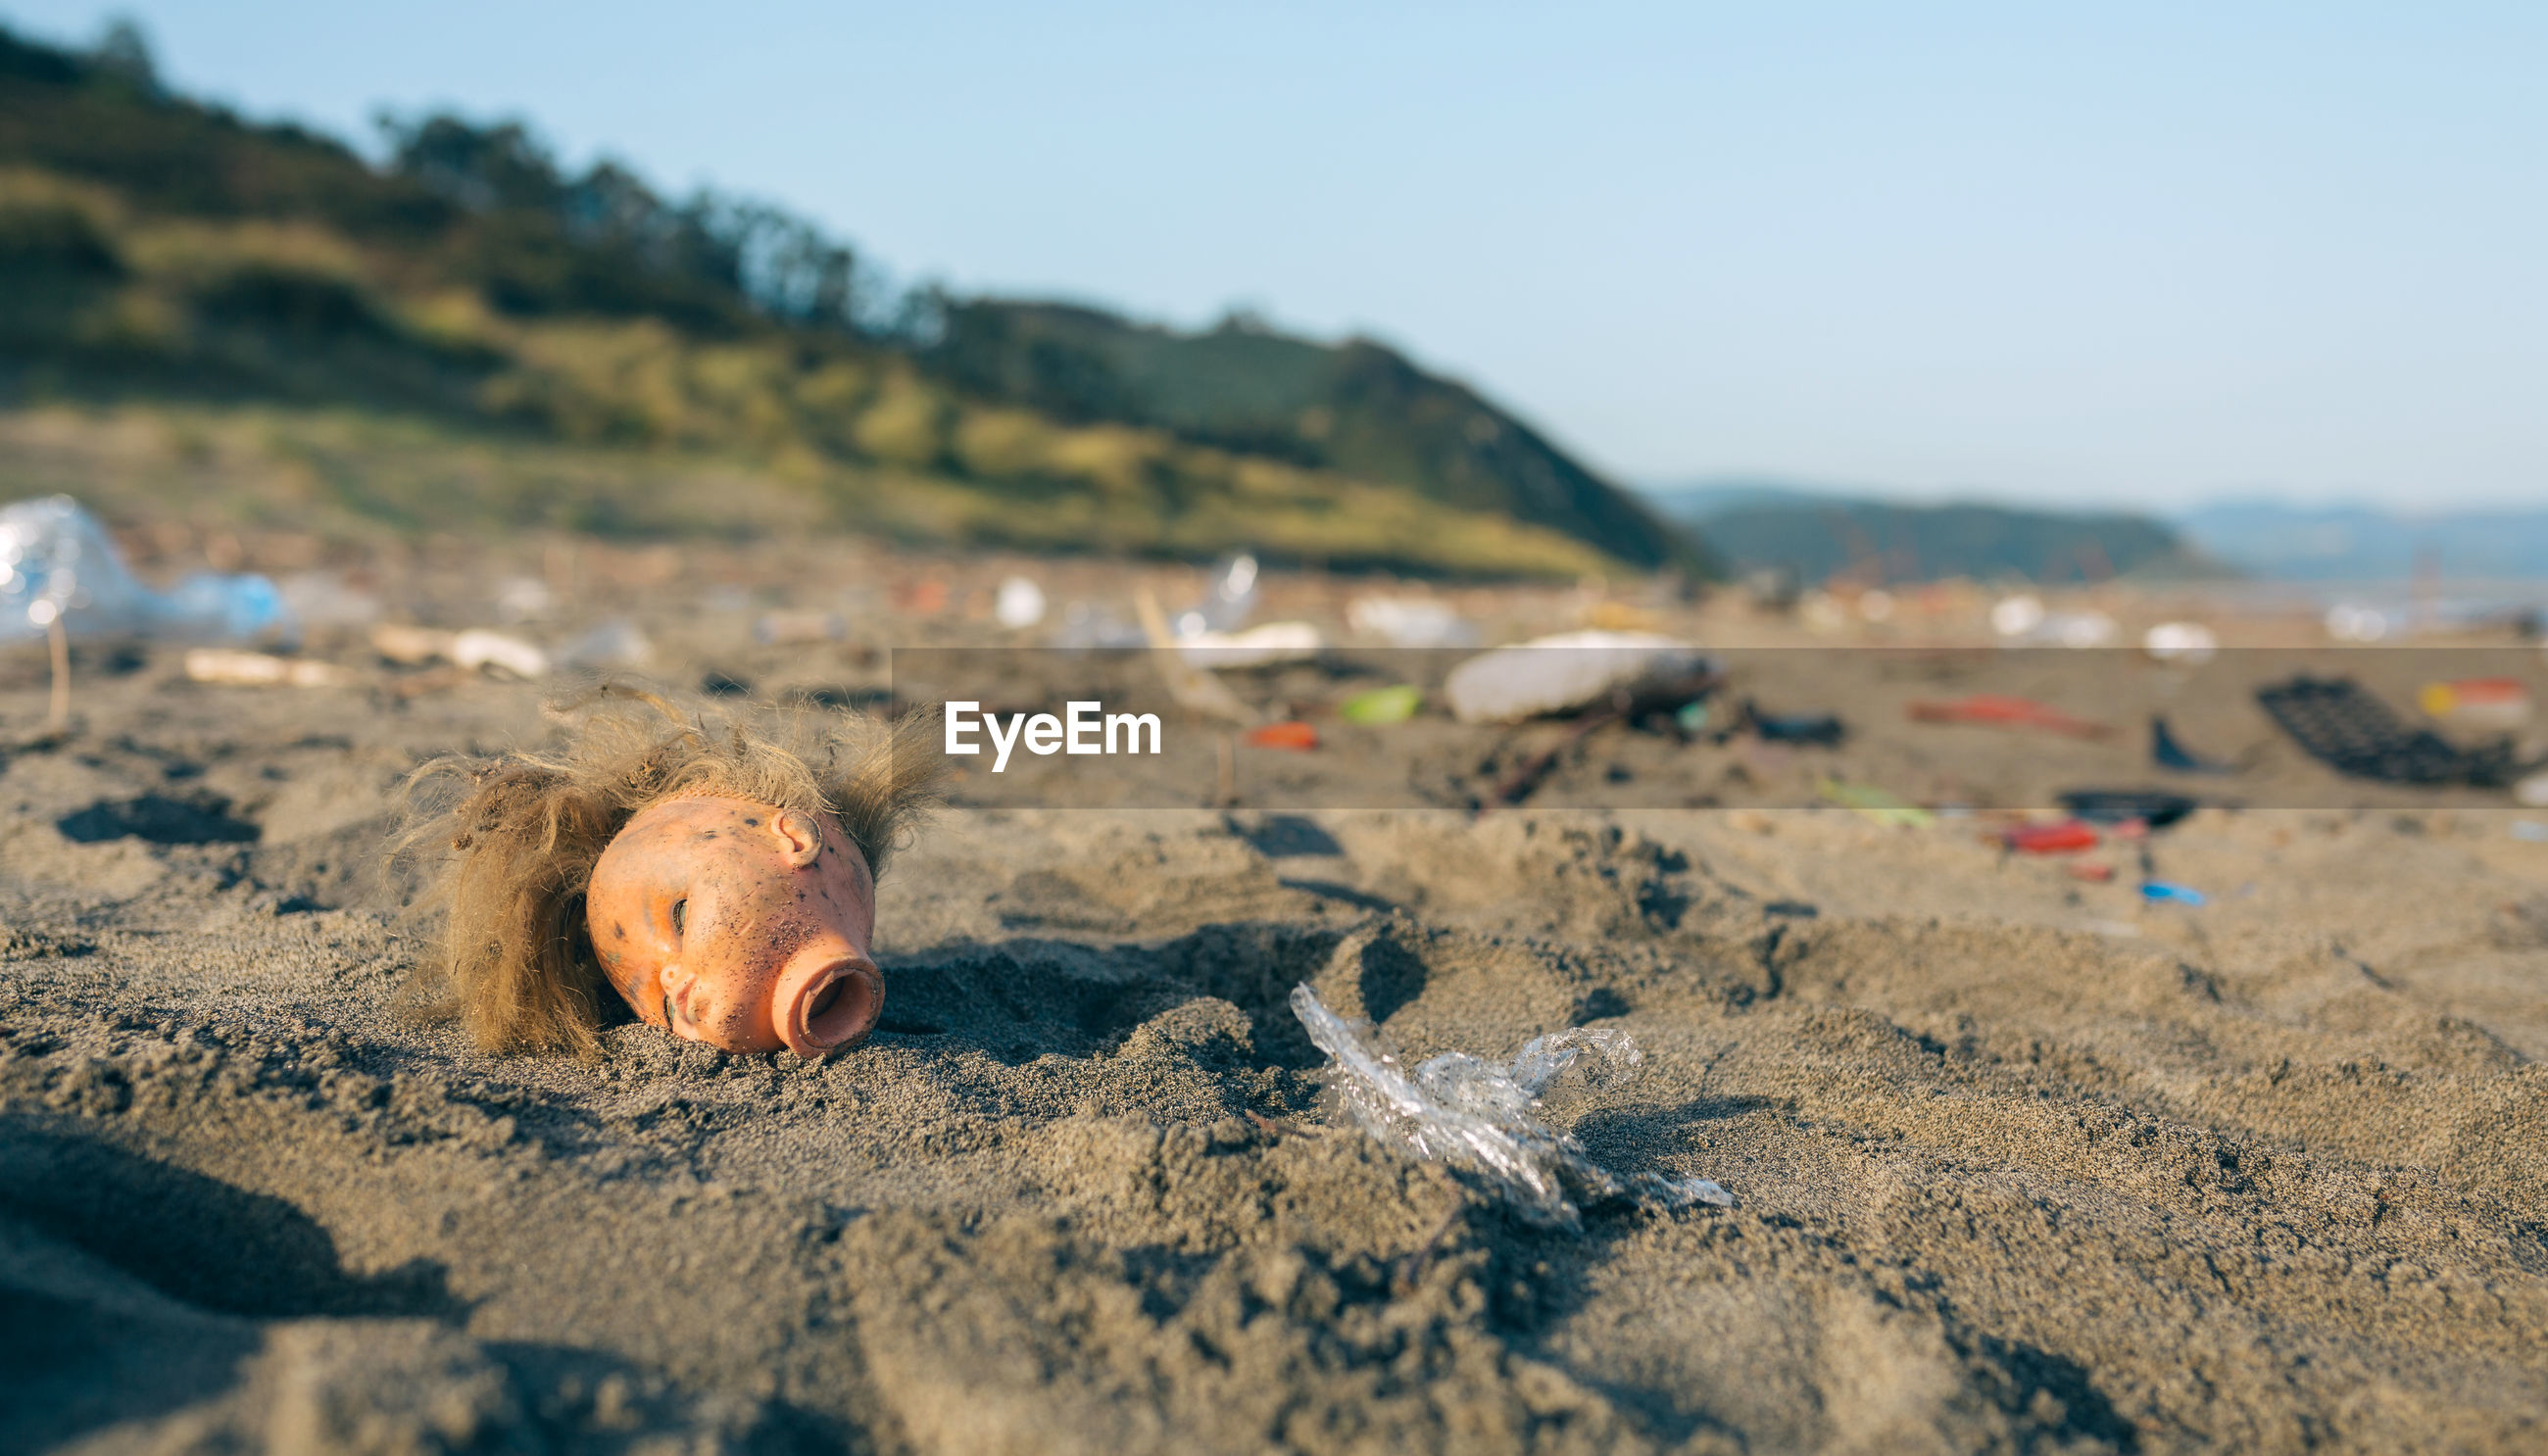 CLOSE-UP OF ANIMAL ON BEACH